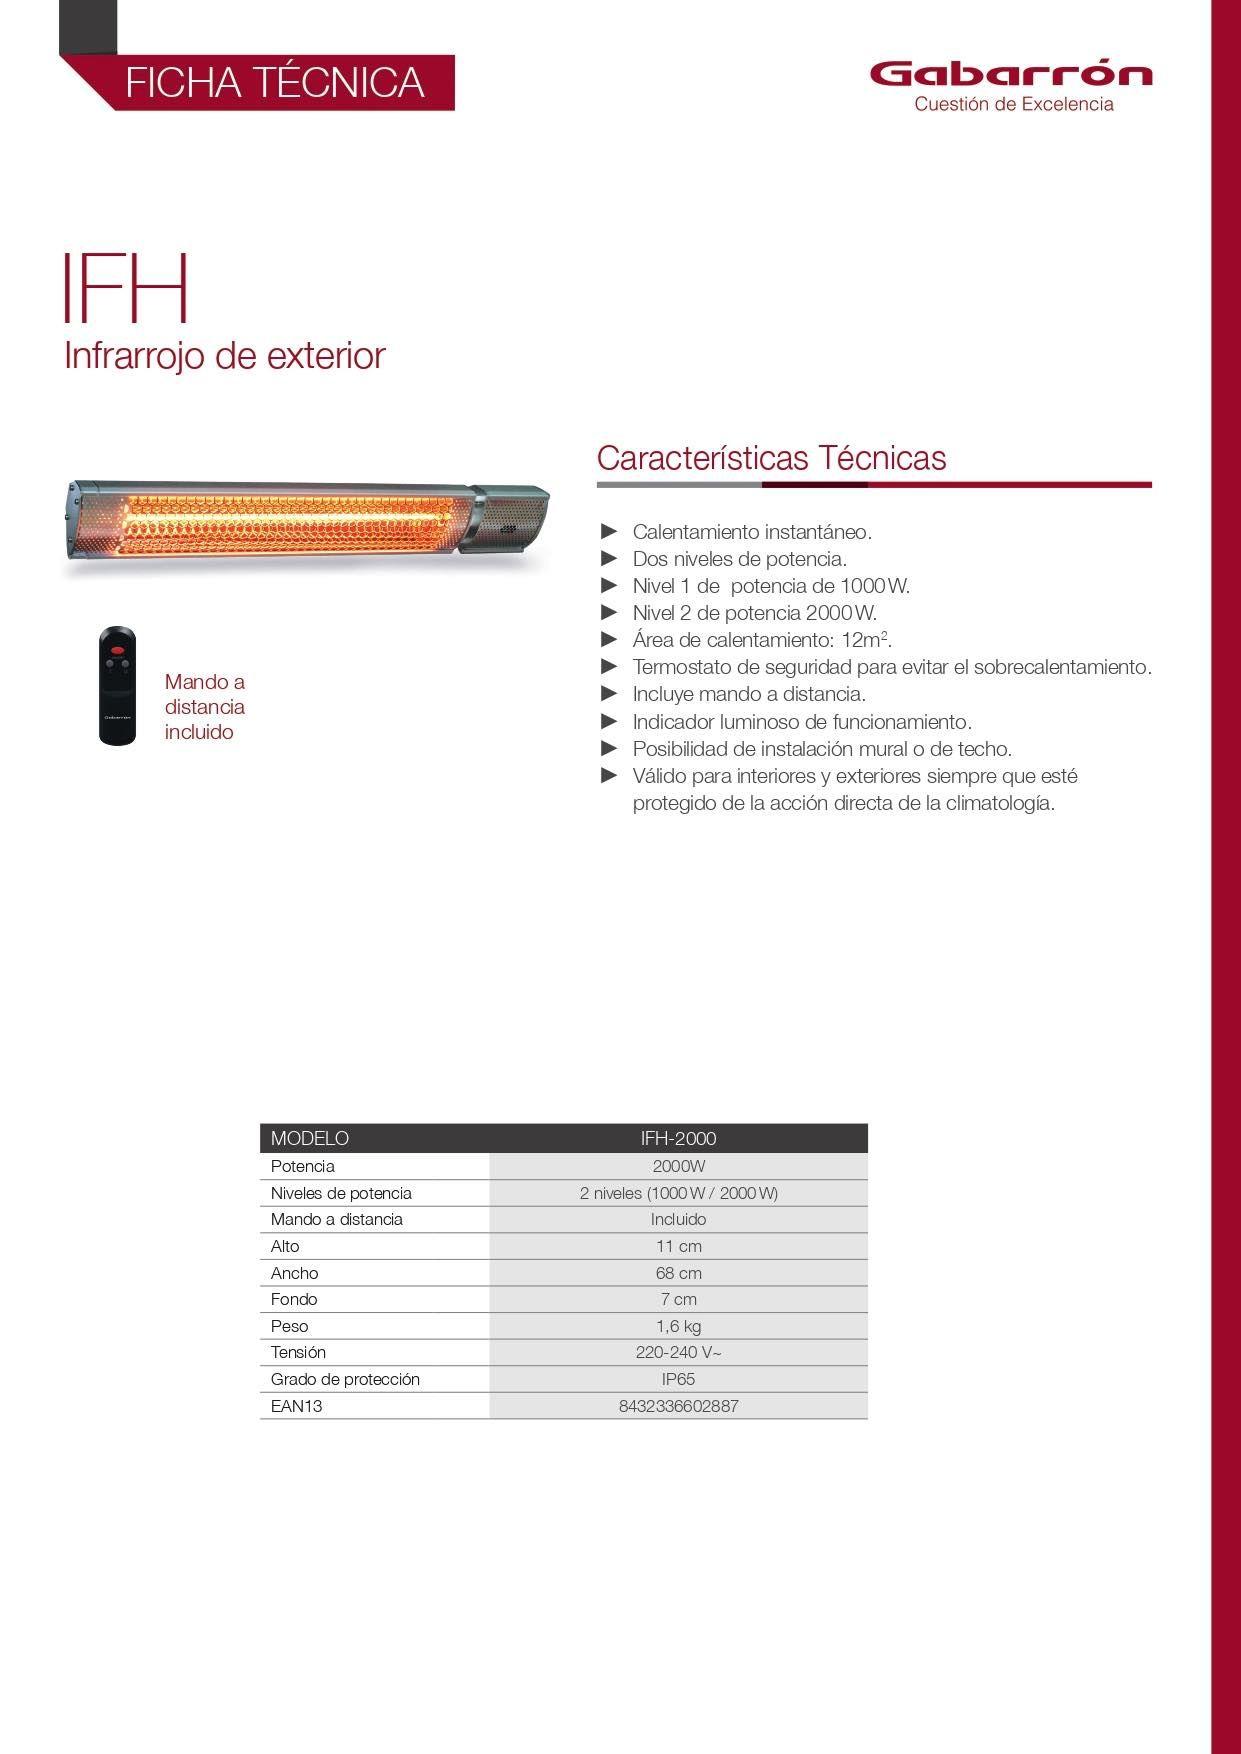 Ficha técnica calefactor infrarrojo Gabarron IFH